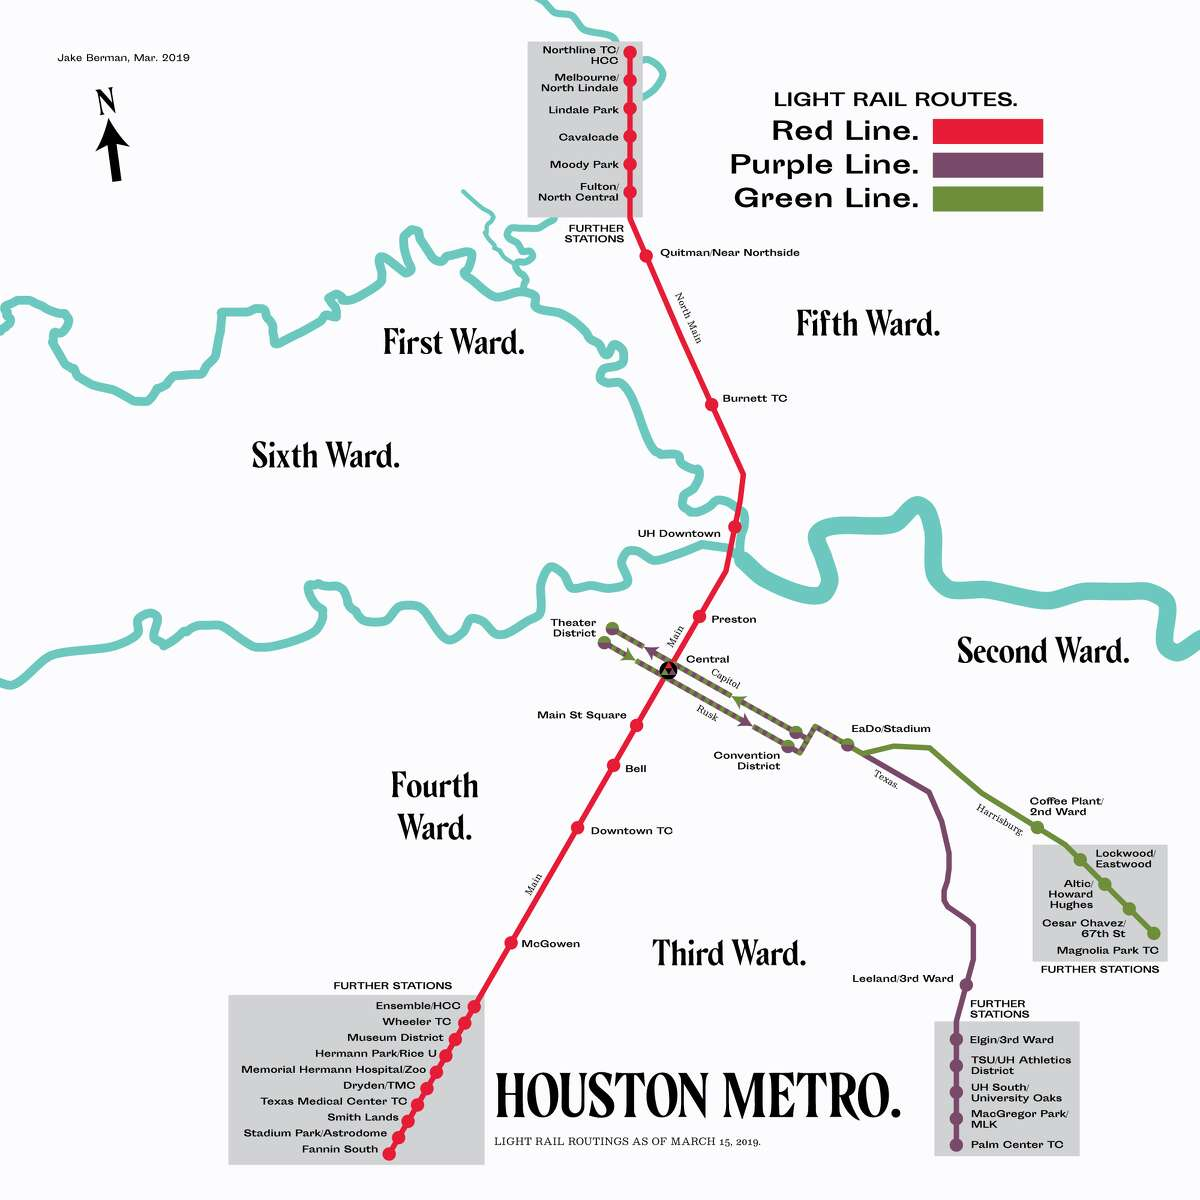 Houston's light rail routings (Artist rendering) Year: 2019